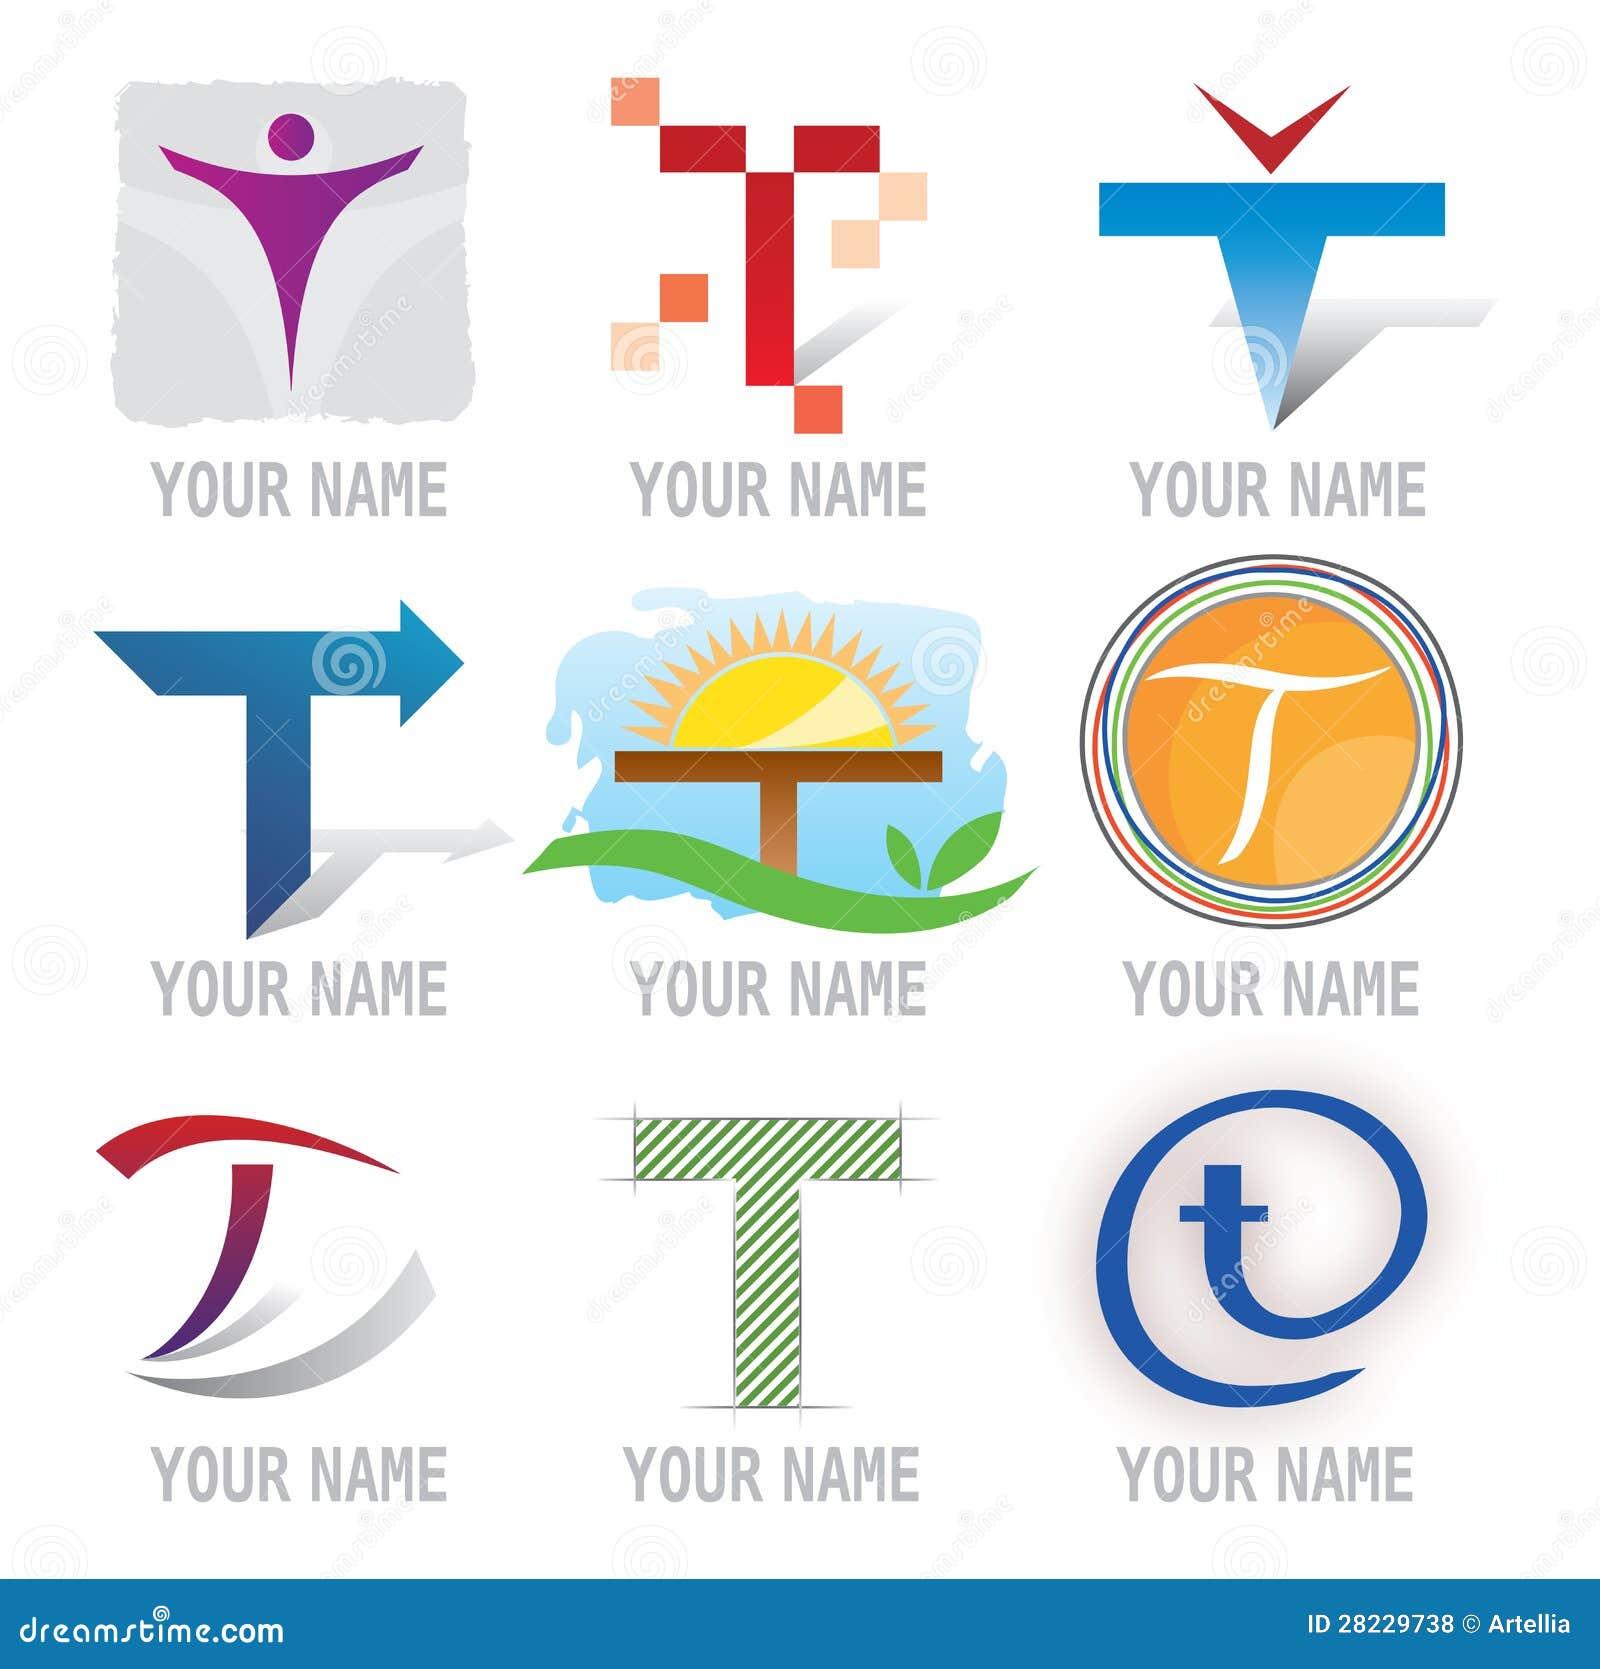 Decoration Company Names